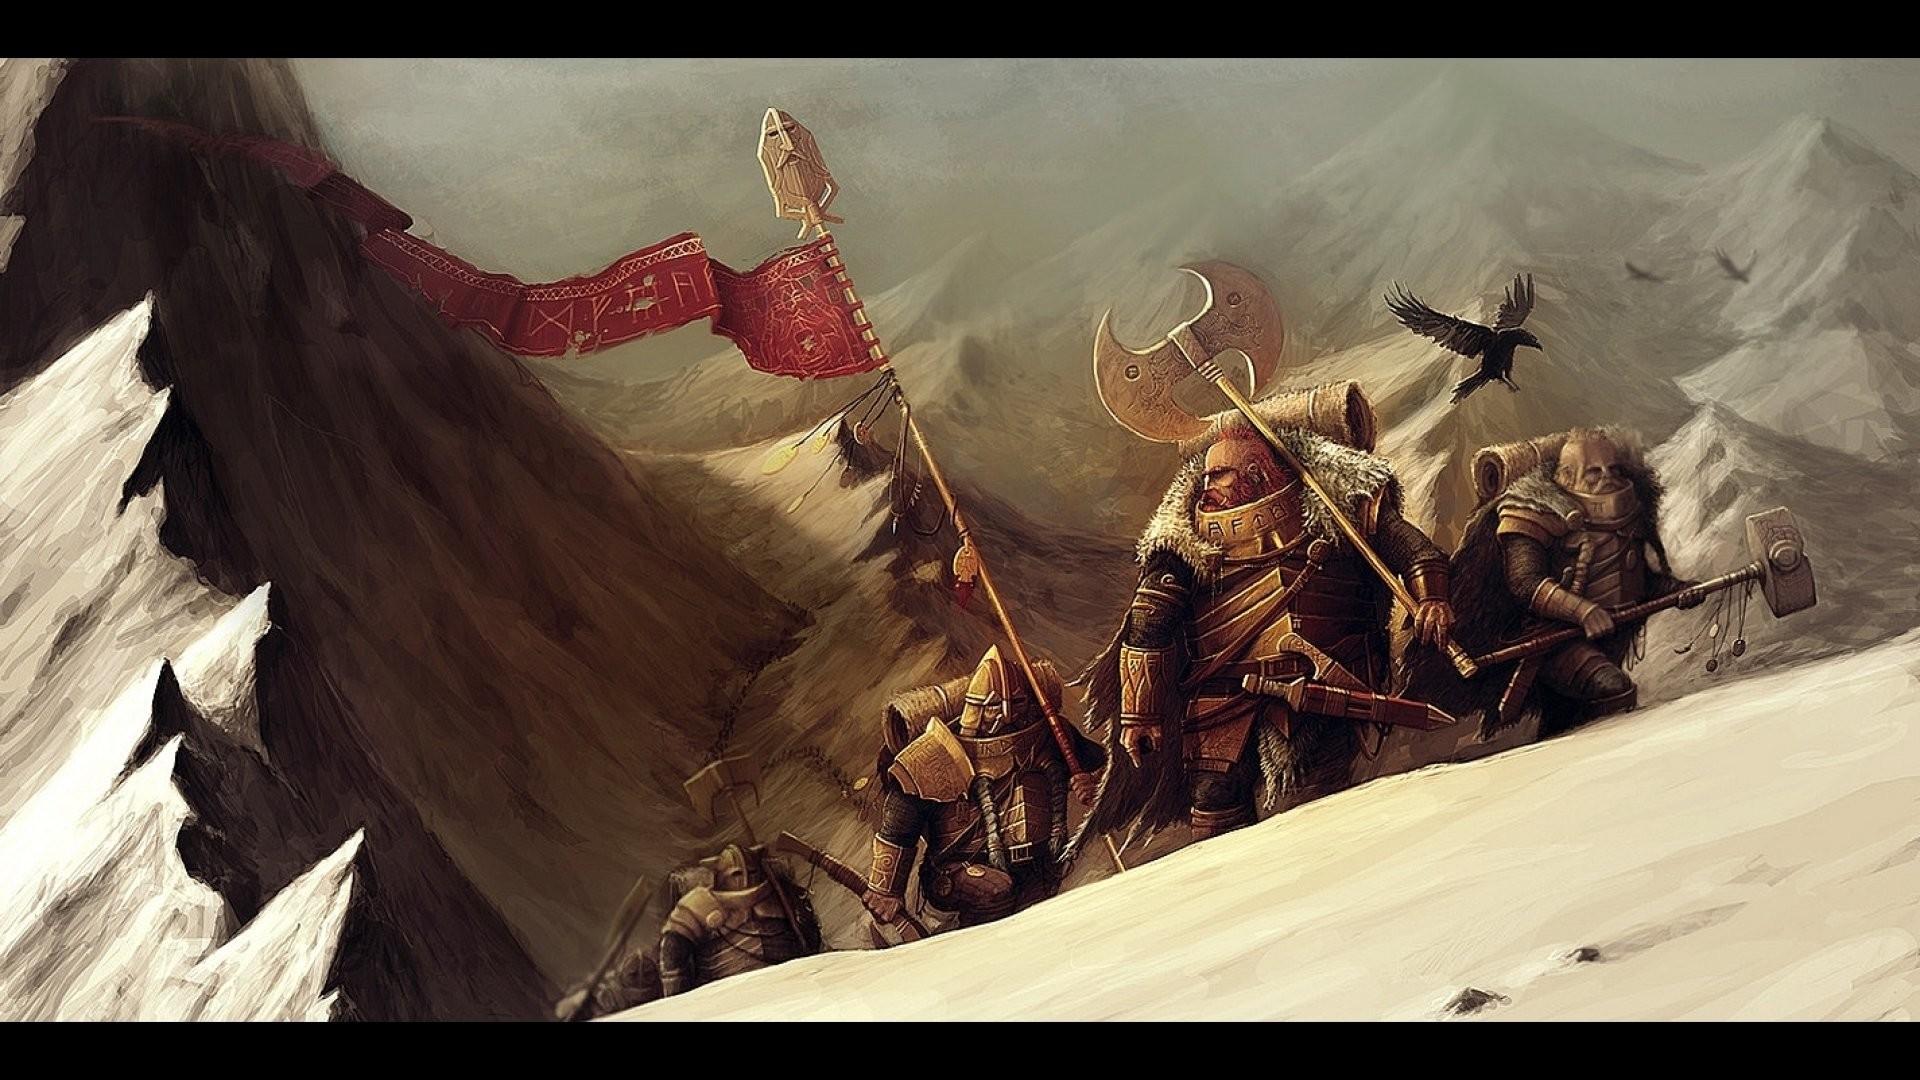 DWARF fantasy warrior art artwork f wallpaper | | 697513 |  WallpaperUP